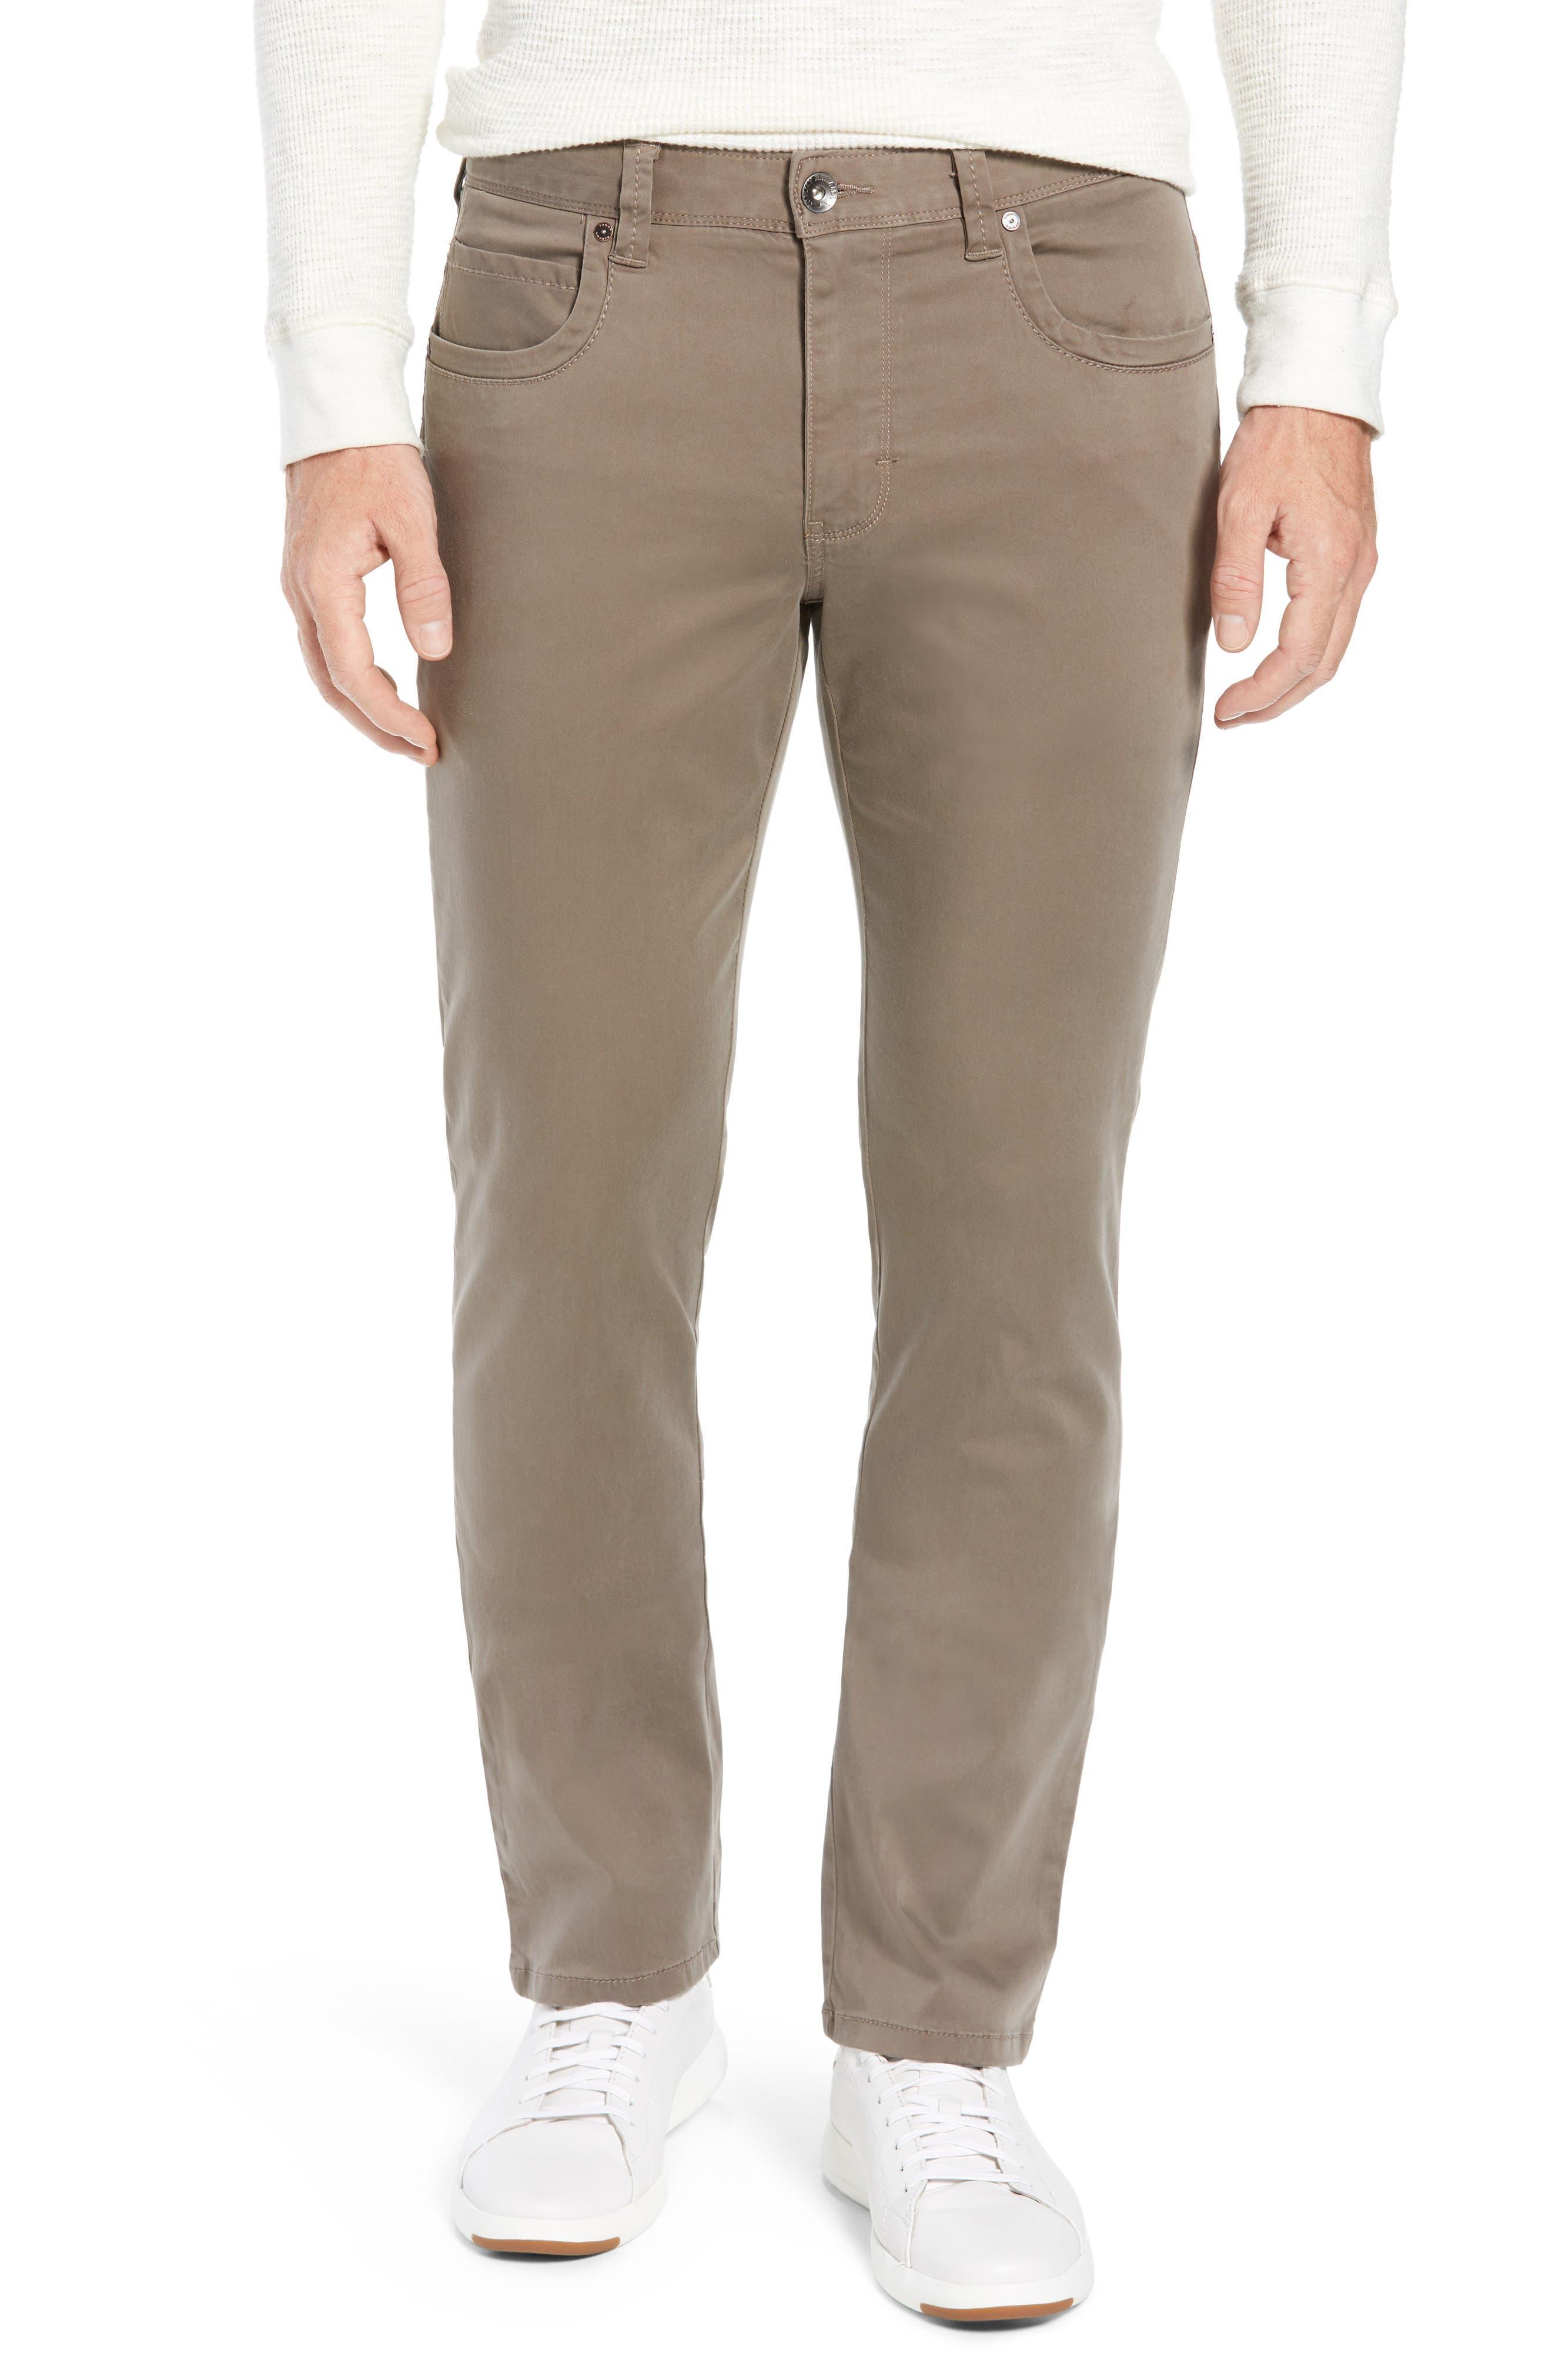 Boracay Pants,                             Main thumbnail 1, color,                             BISON